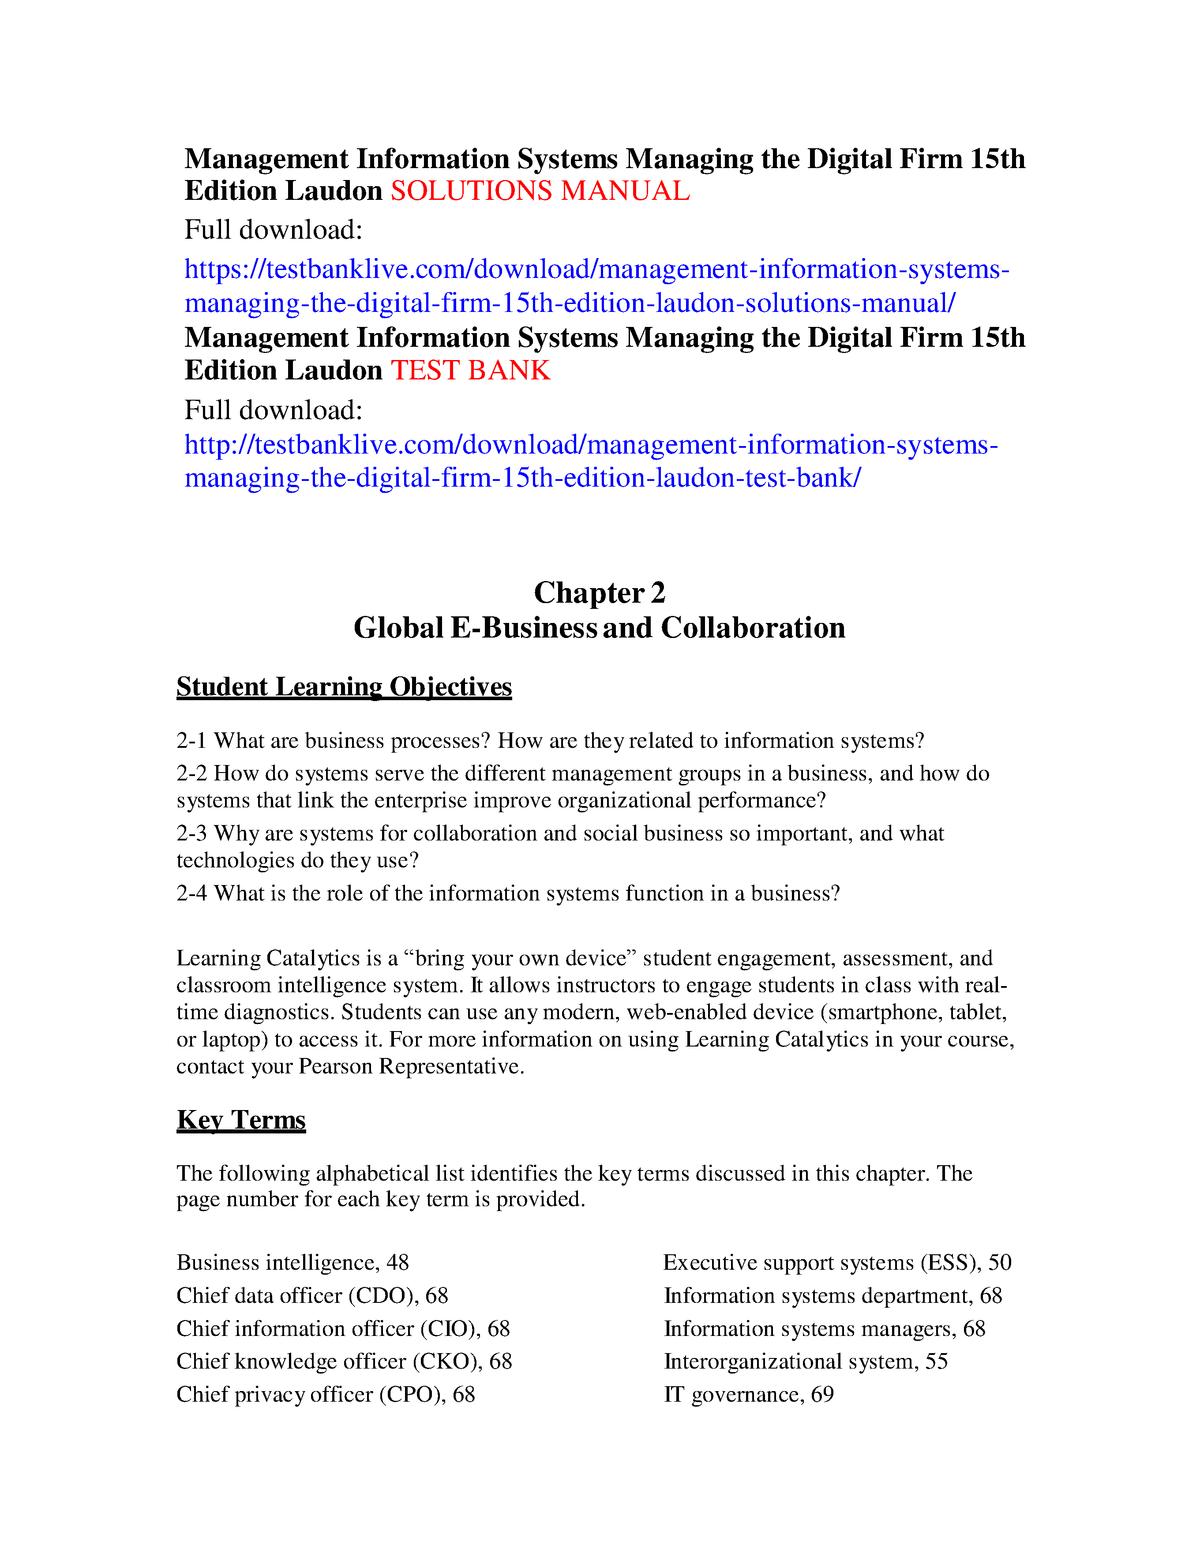 Docit - Solution manual Management Information Systems - StuDocu